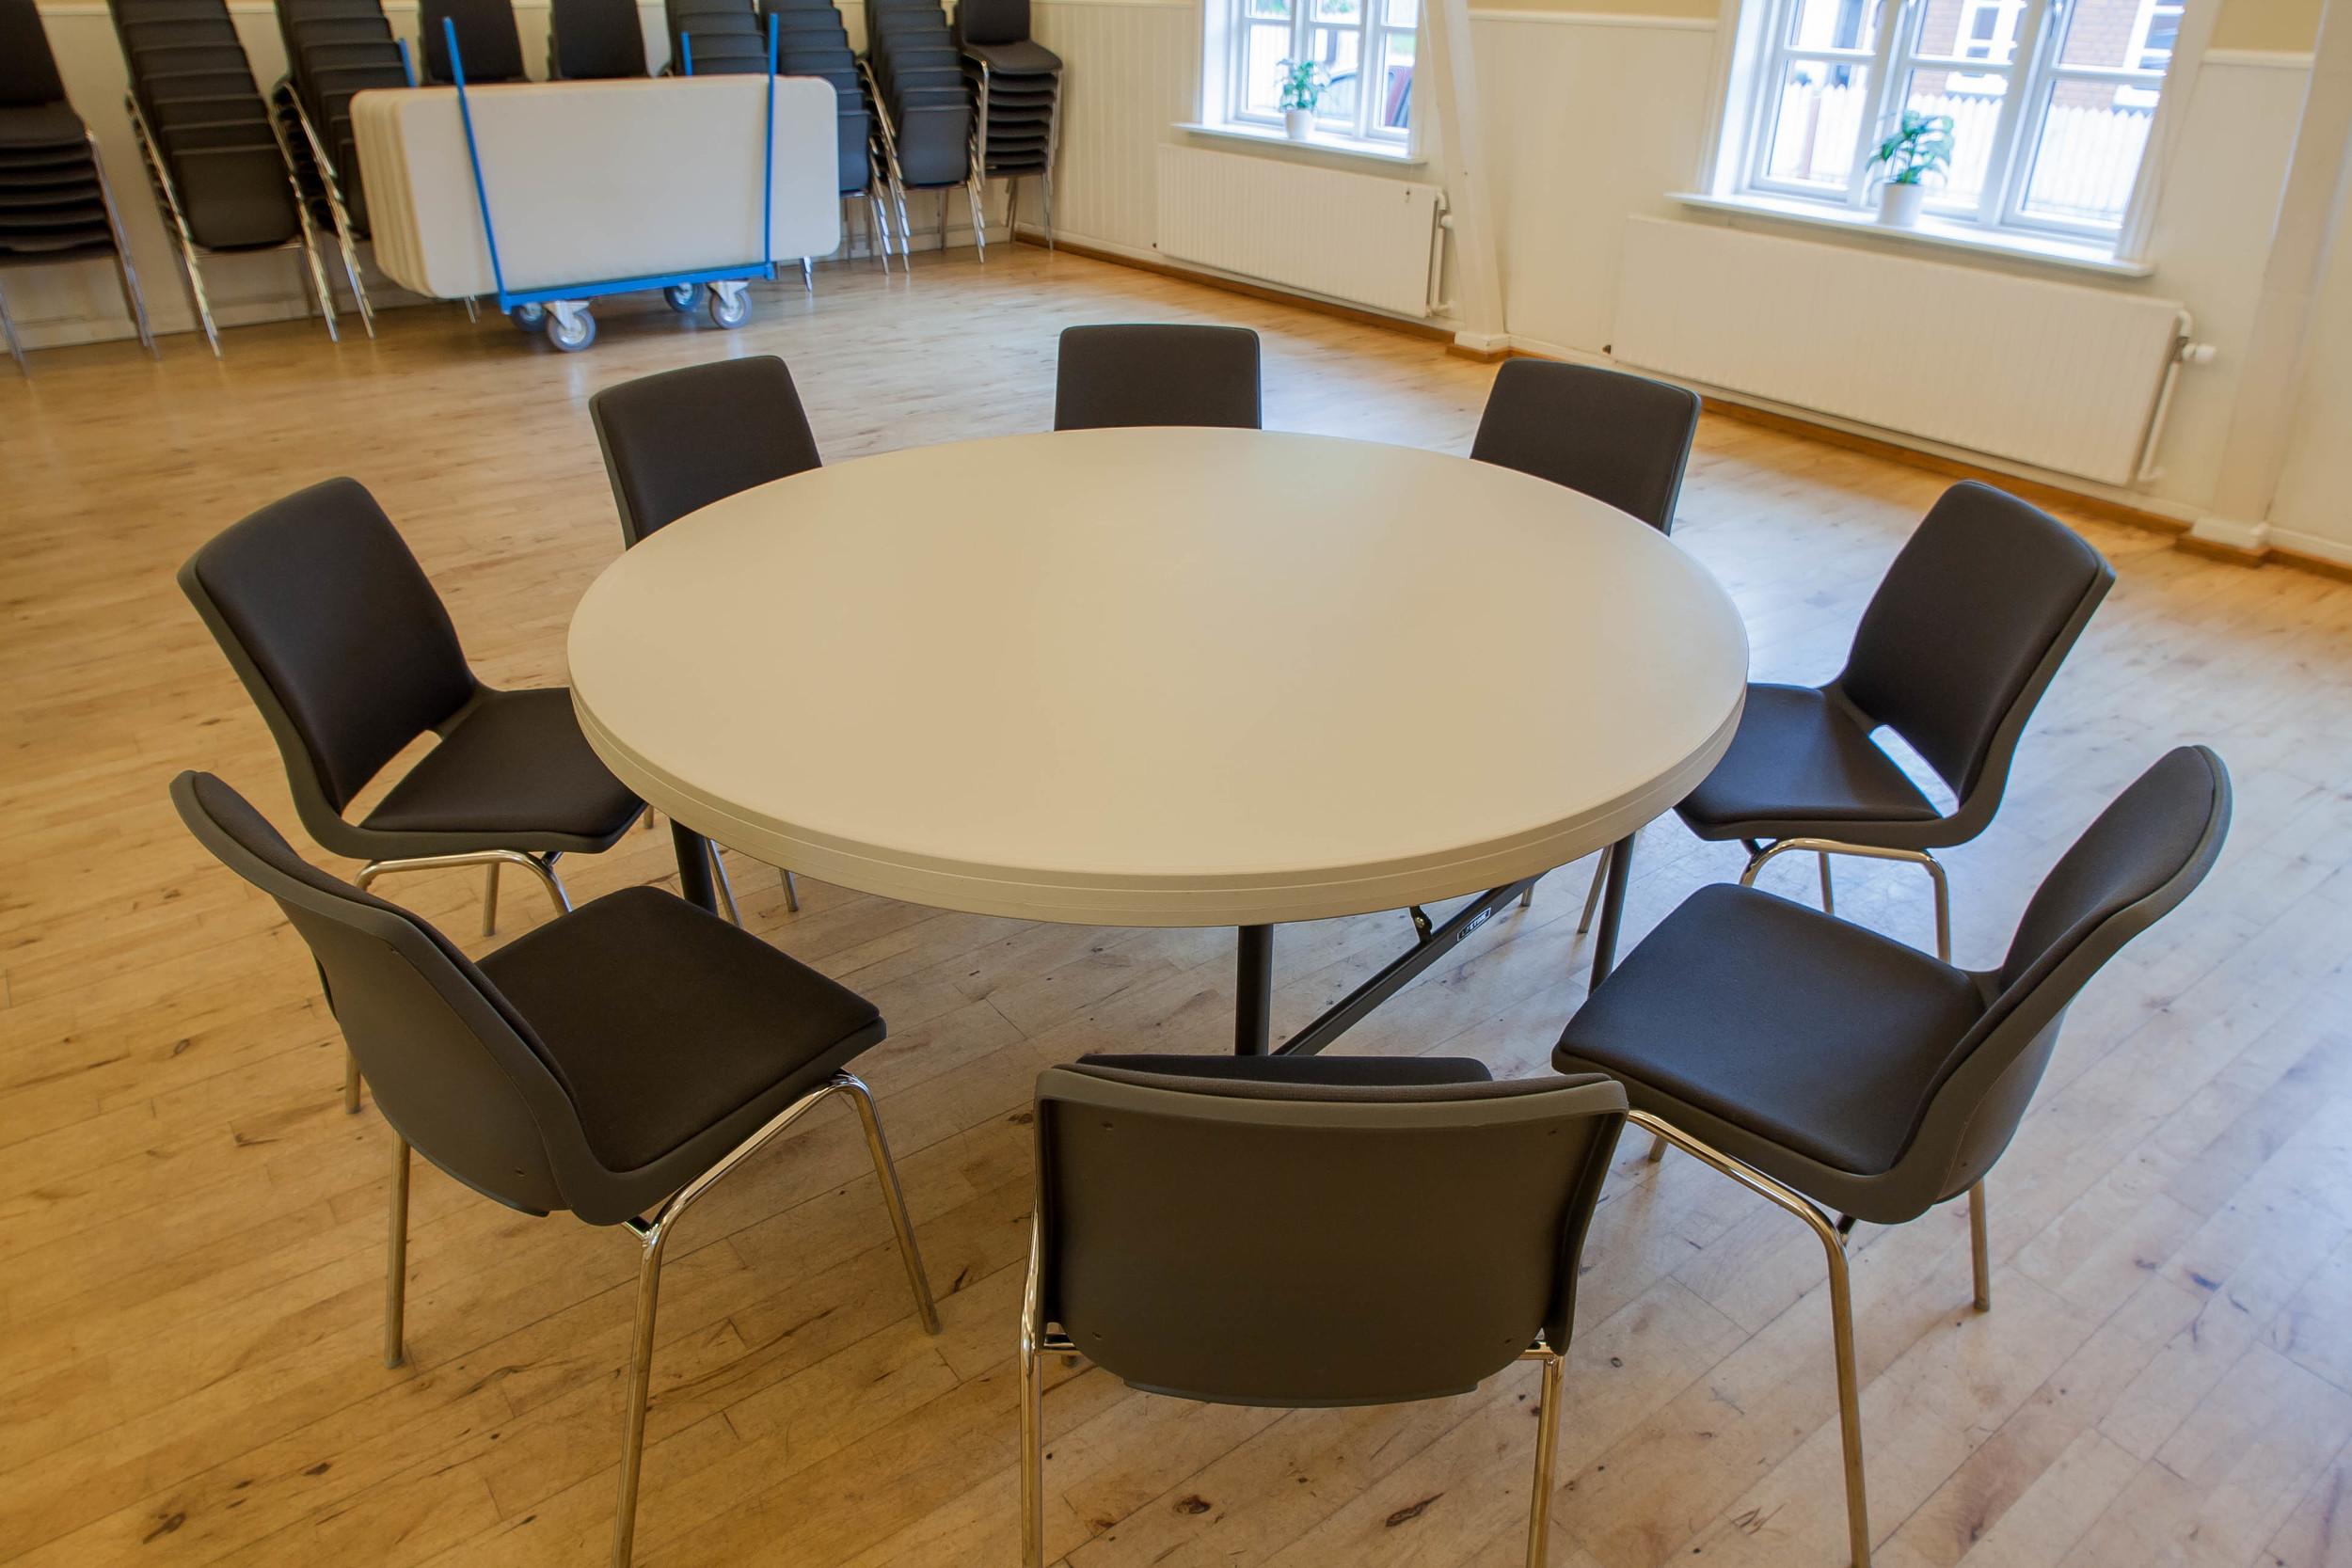 Rundt bord 8 personer.